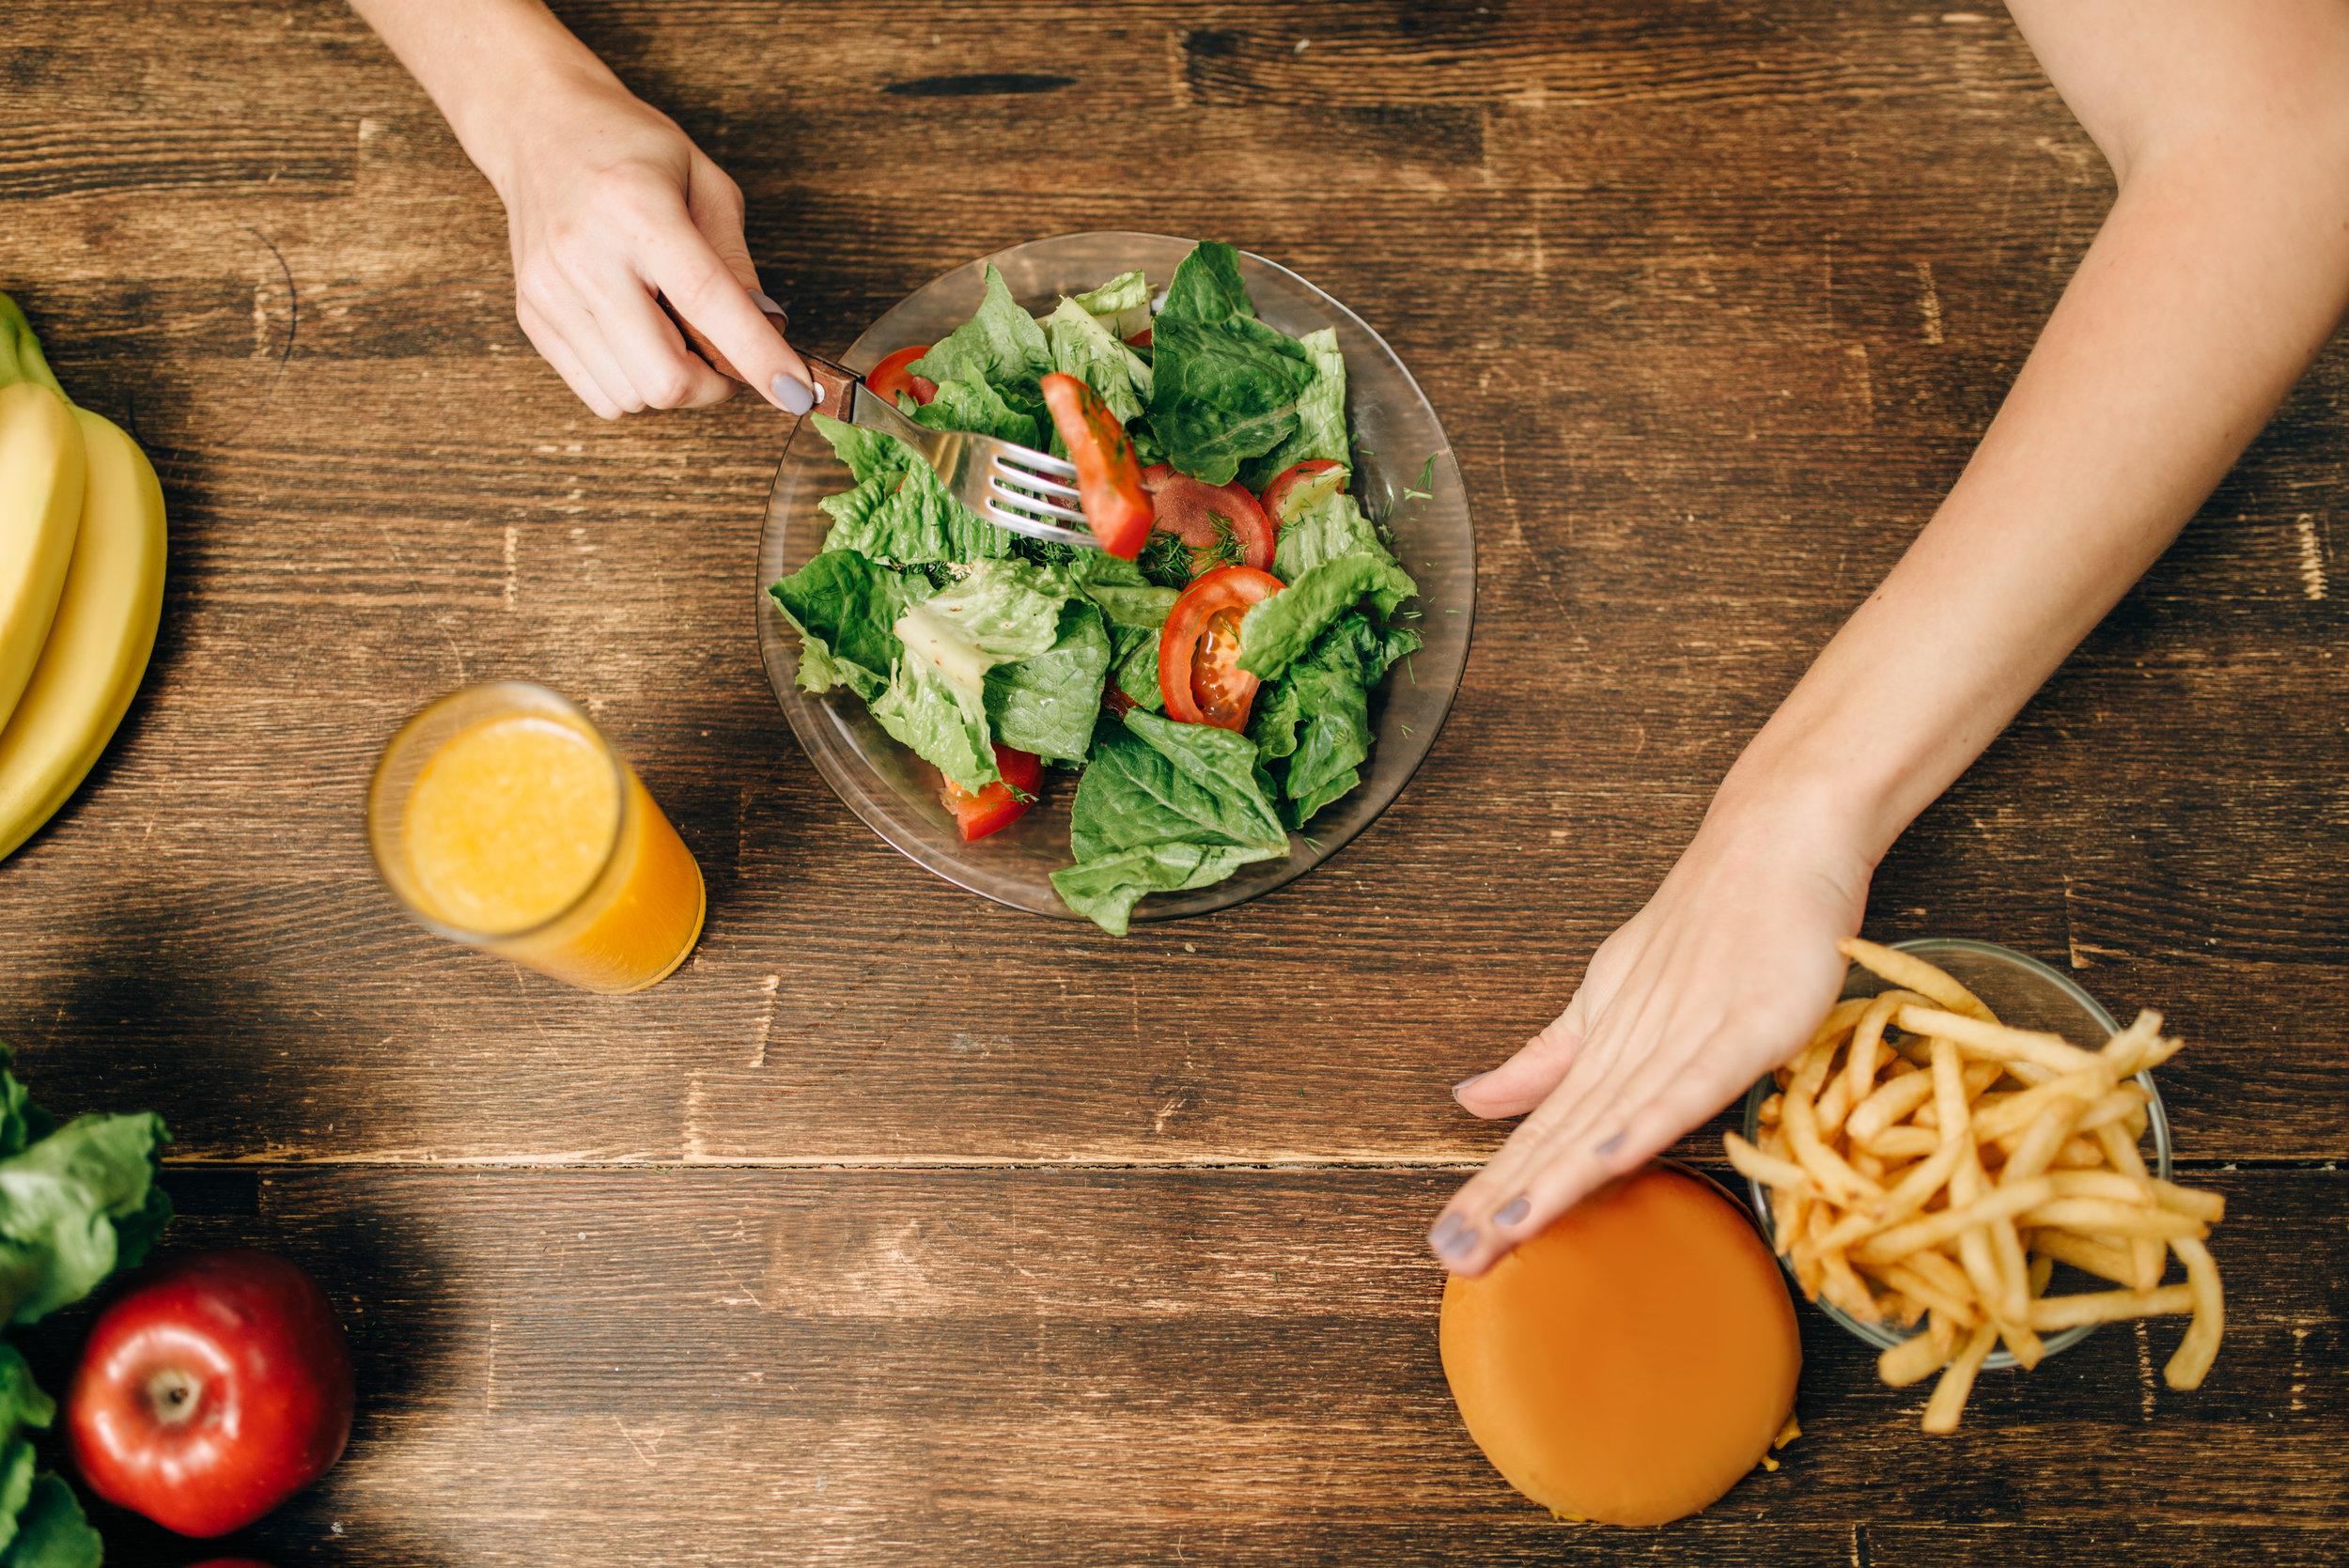 female-person-choose-healthy-organic-food-PUKFWXQ.jpg